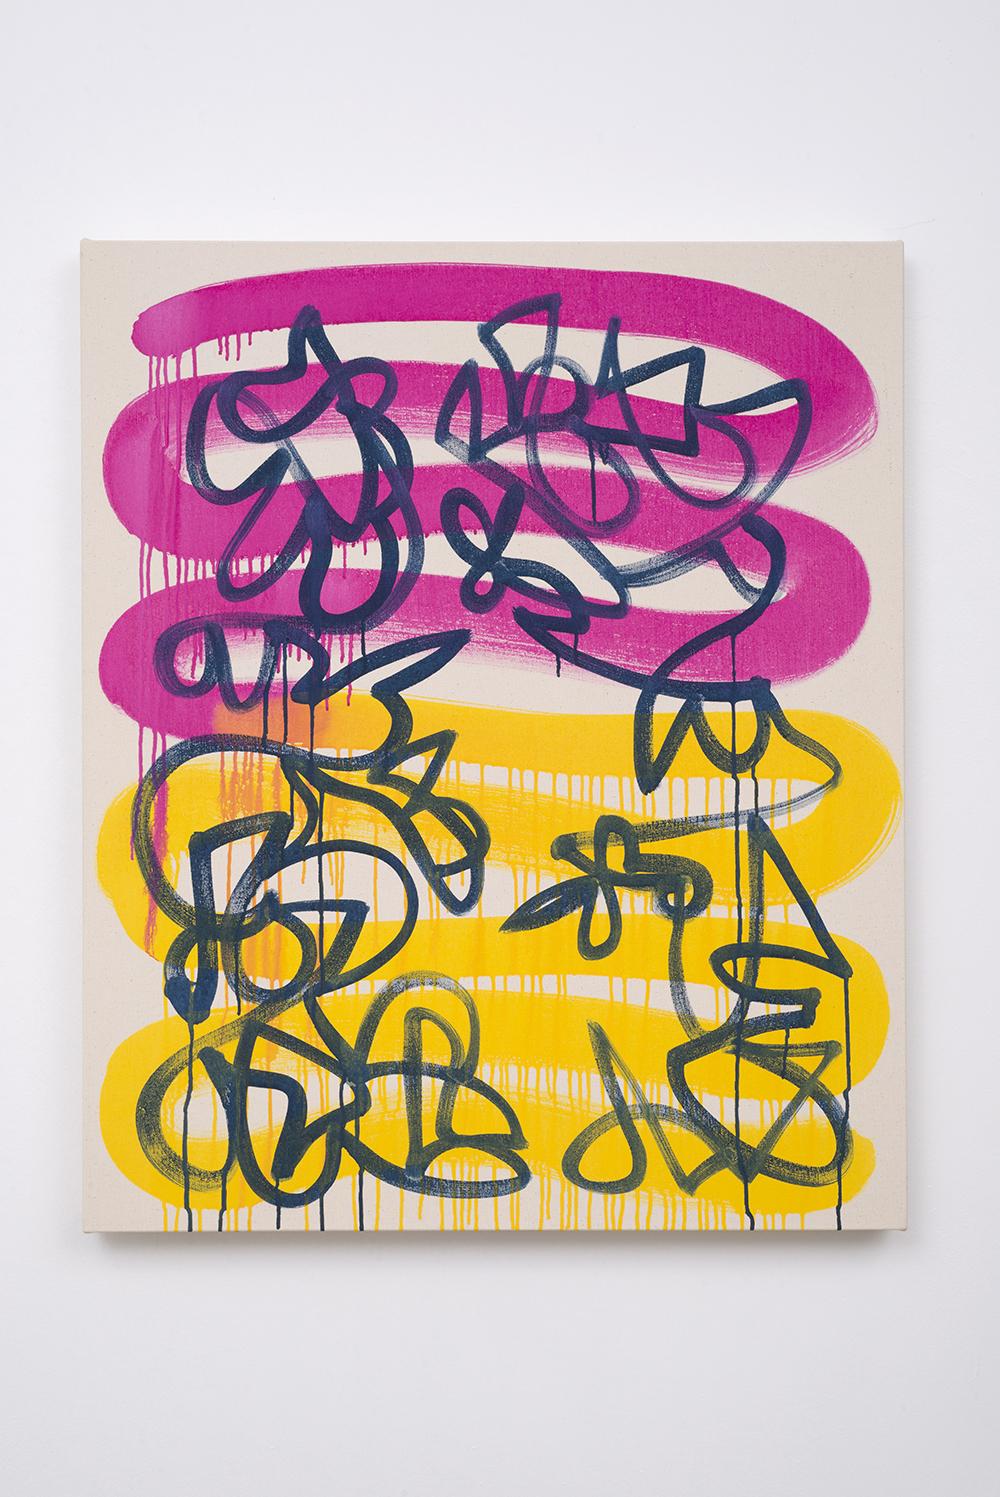 Monique Prieto, Merengue , 2014, oil on primed canvas, 36 x 30 inches